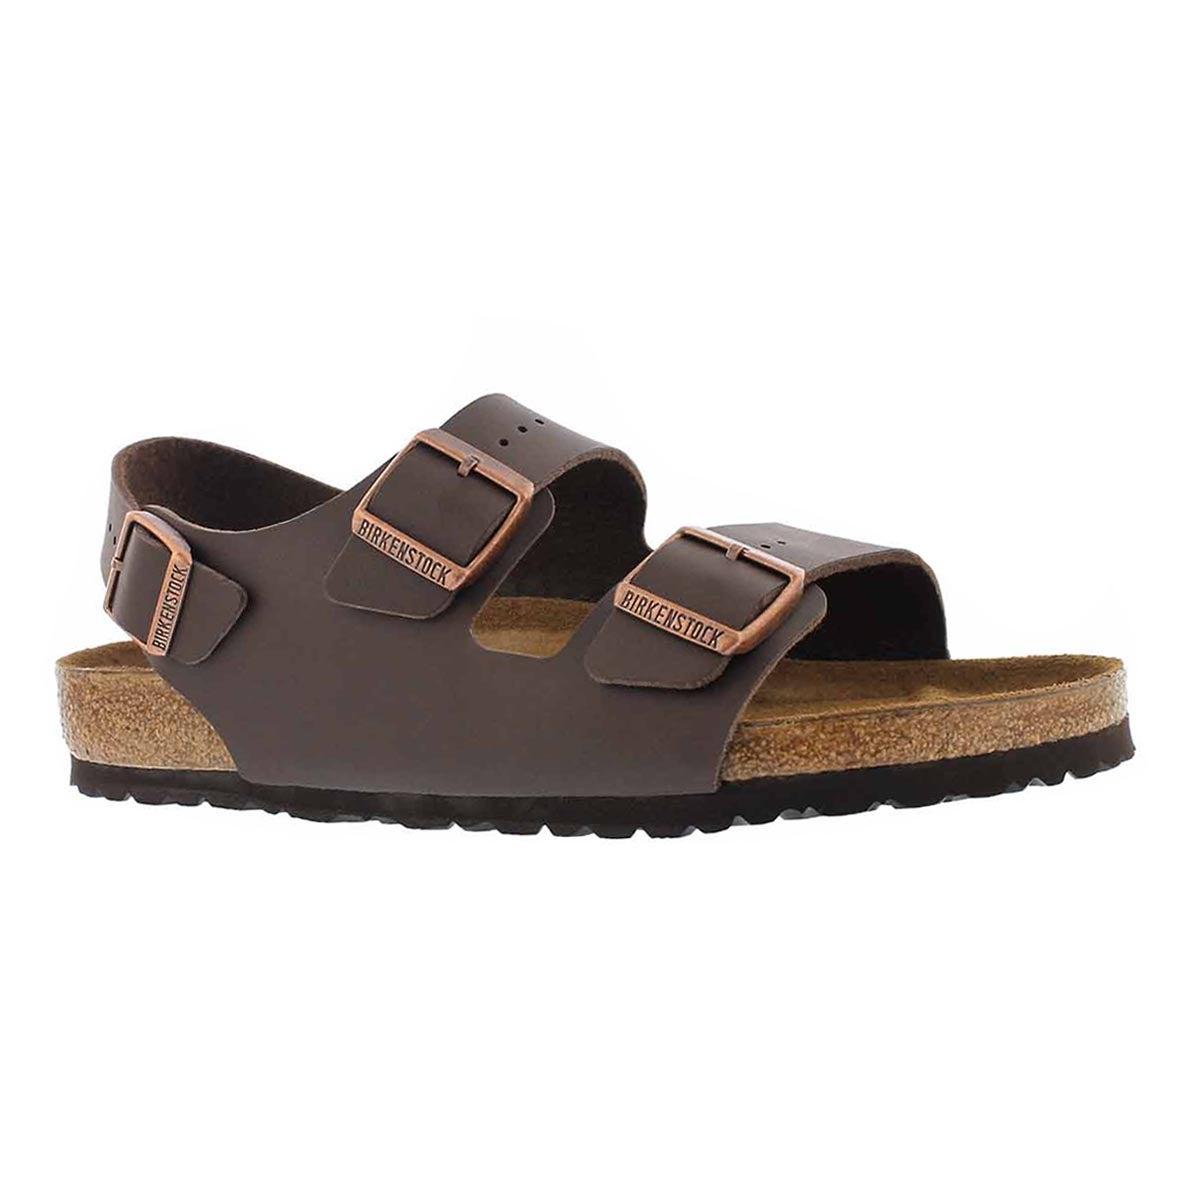 Women's MILANO BF brown 3 strap sandals